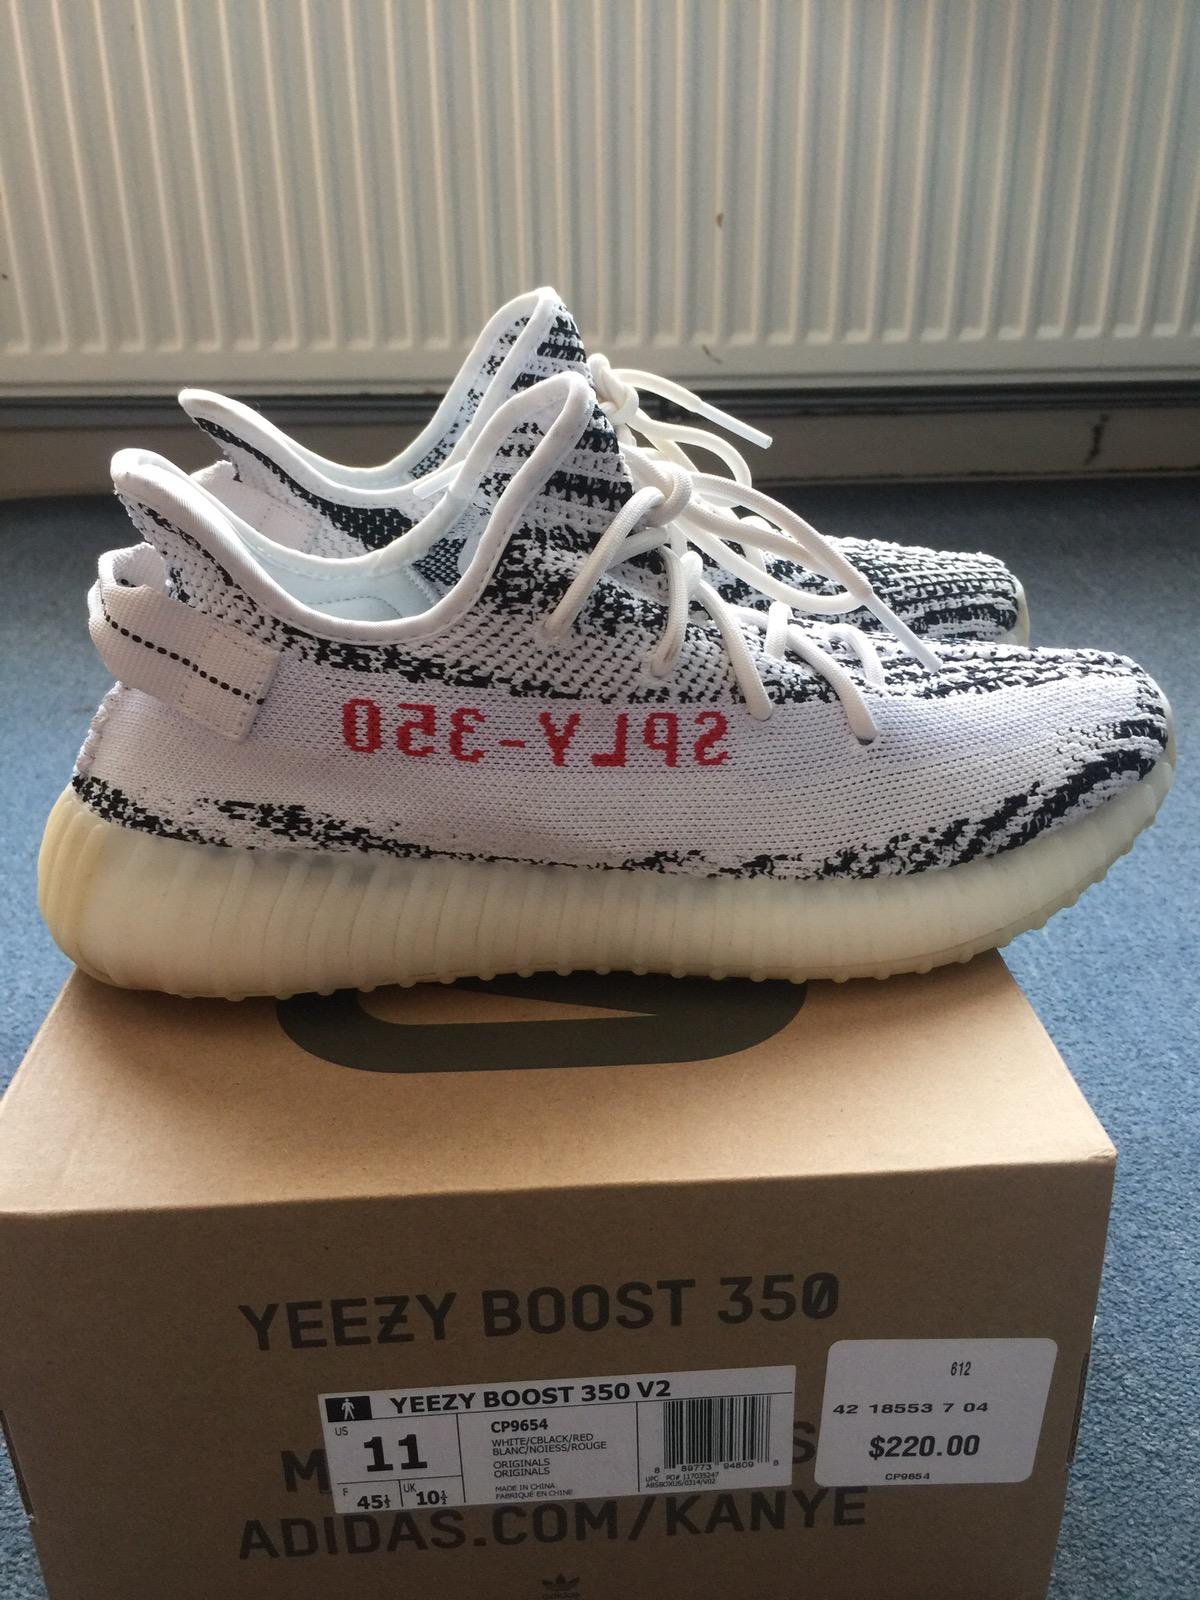 c532ed183e62b Adidas Kanye West Adidas Yeezy Boost 350 V2 Zebra Size 11 - Low-Top ...